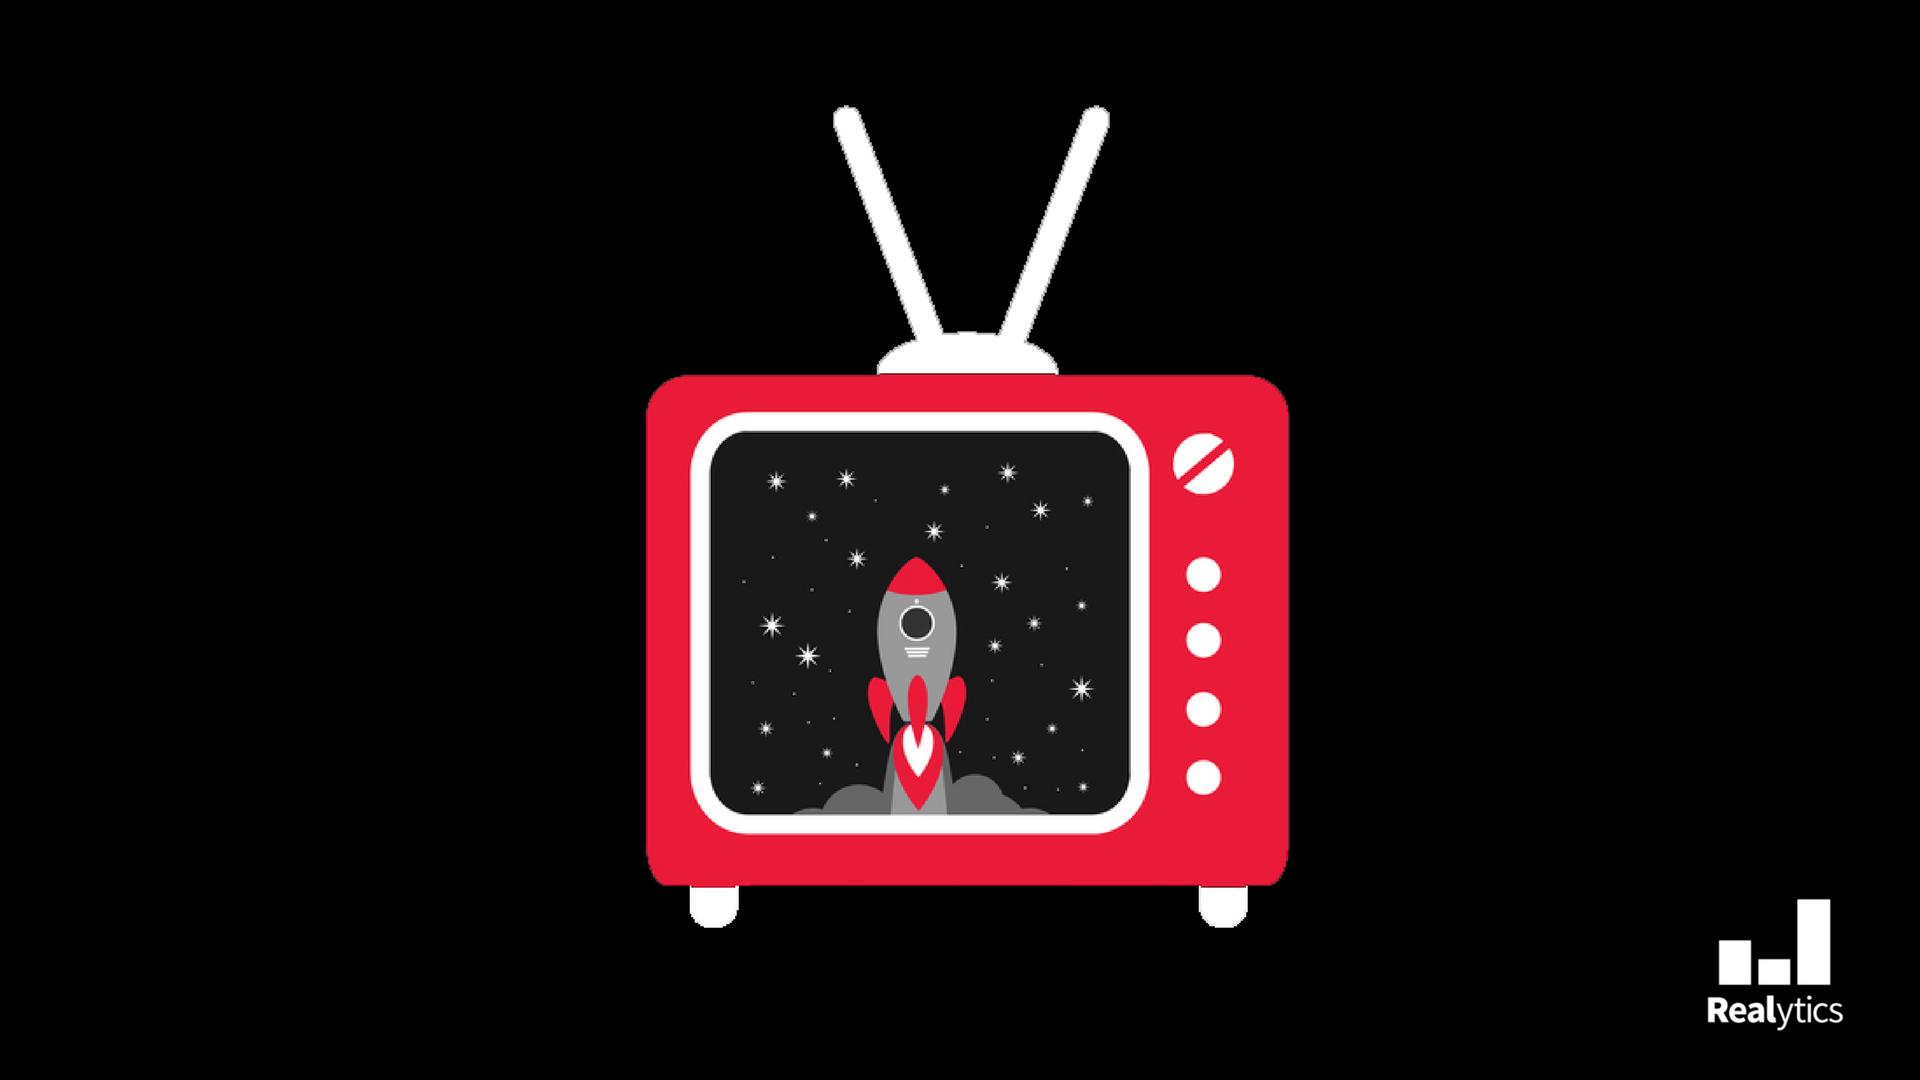 visuel-de-fond-TV-programmatique